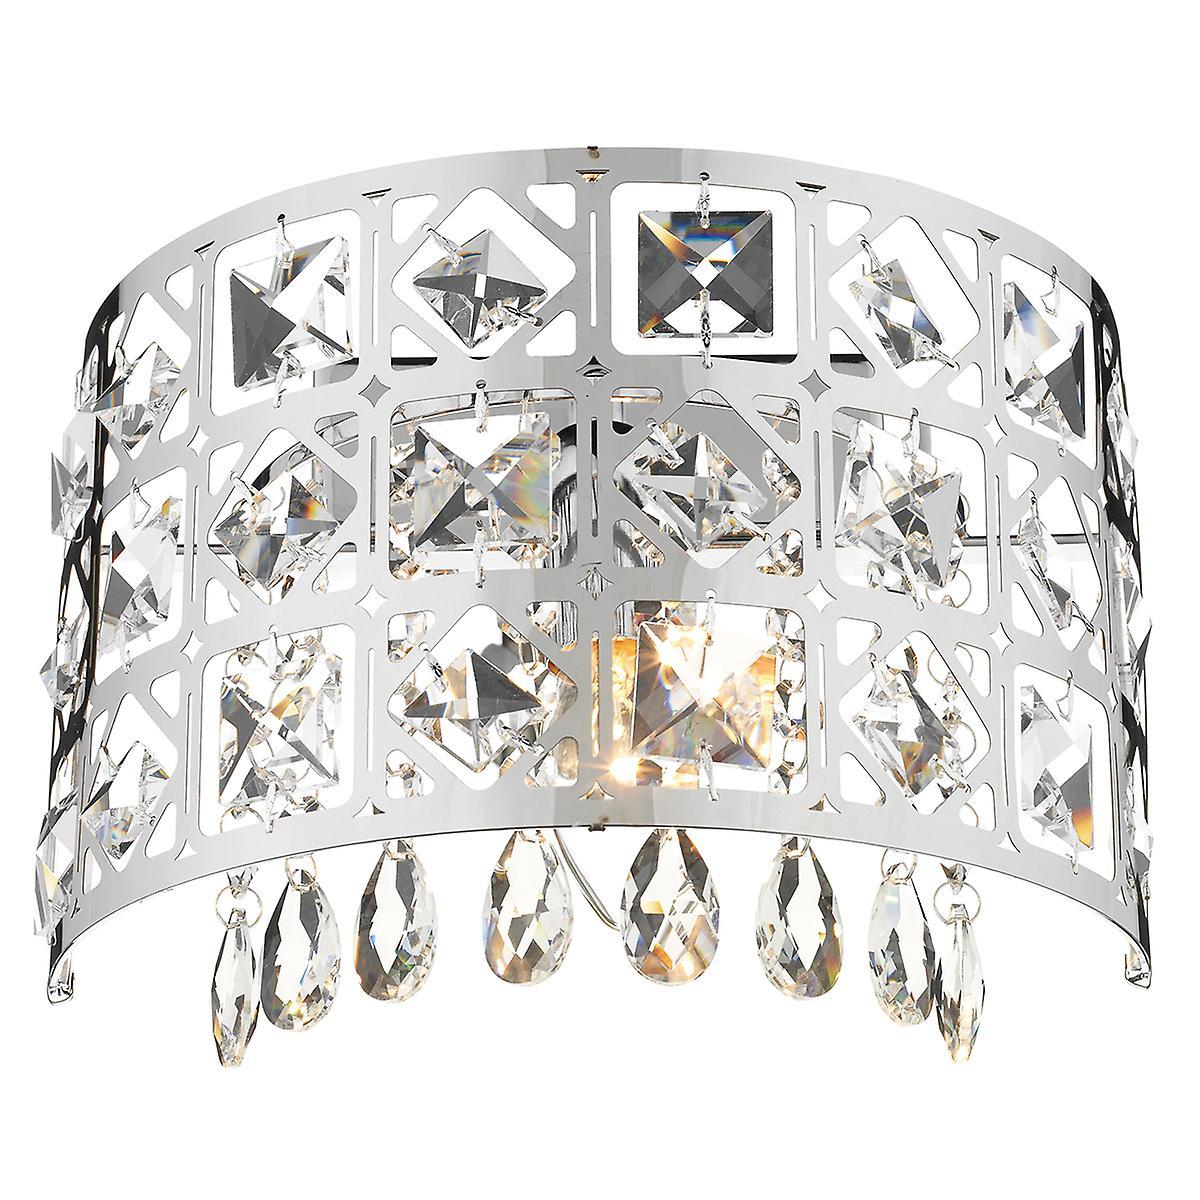 Dar DUC0750 Duchess Modern Chrome Double Insulated Crystal Wall Light